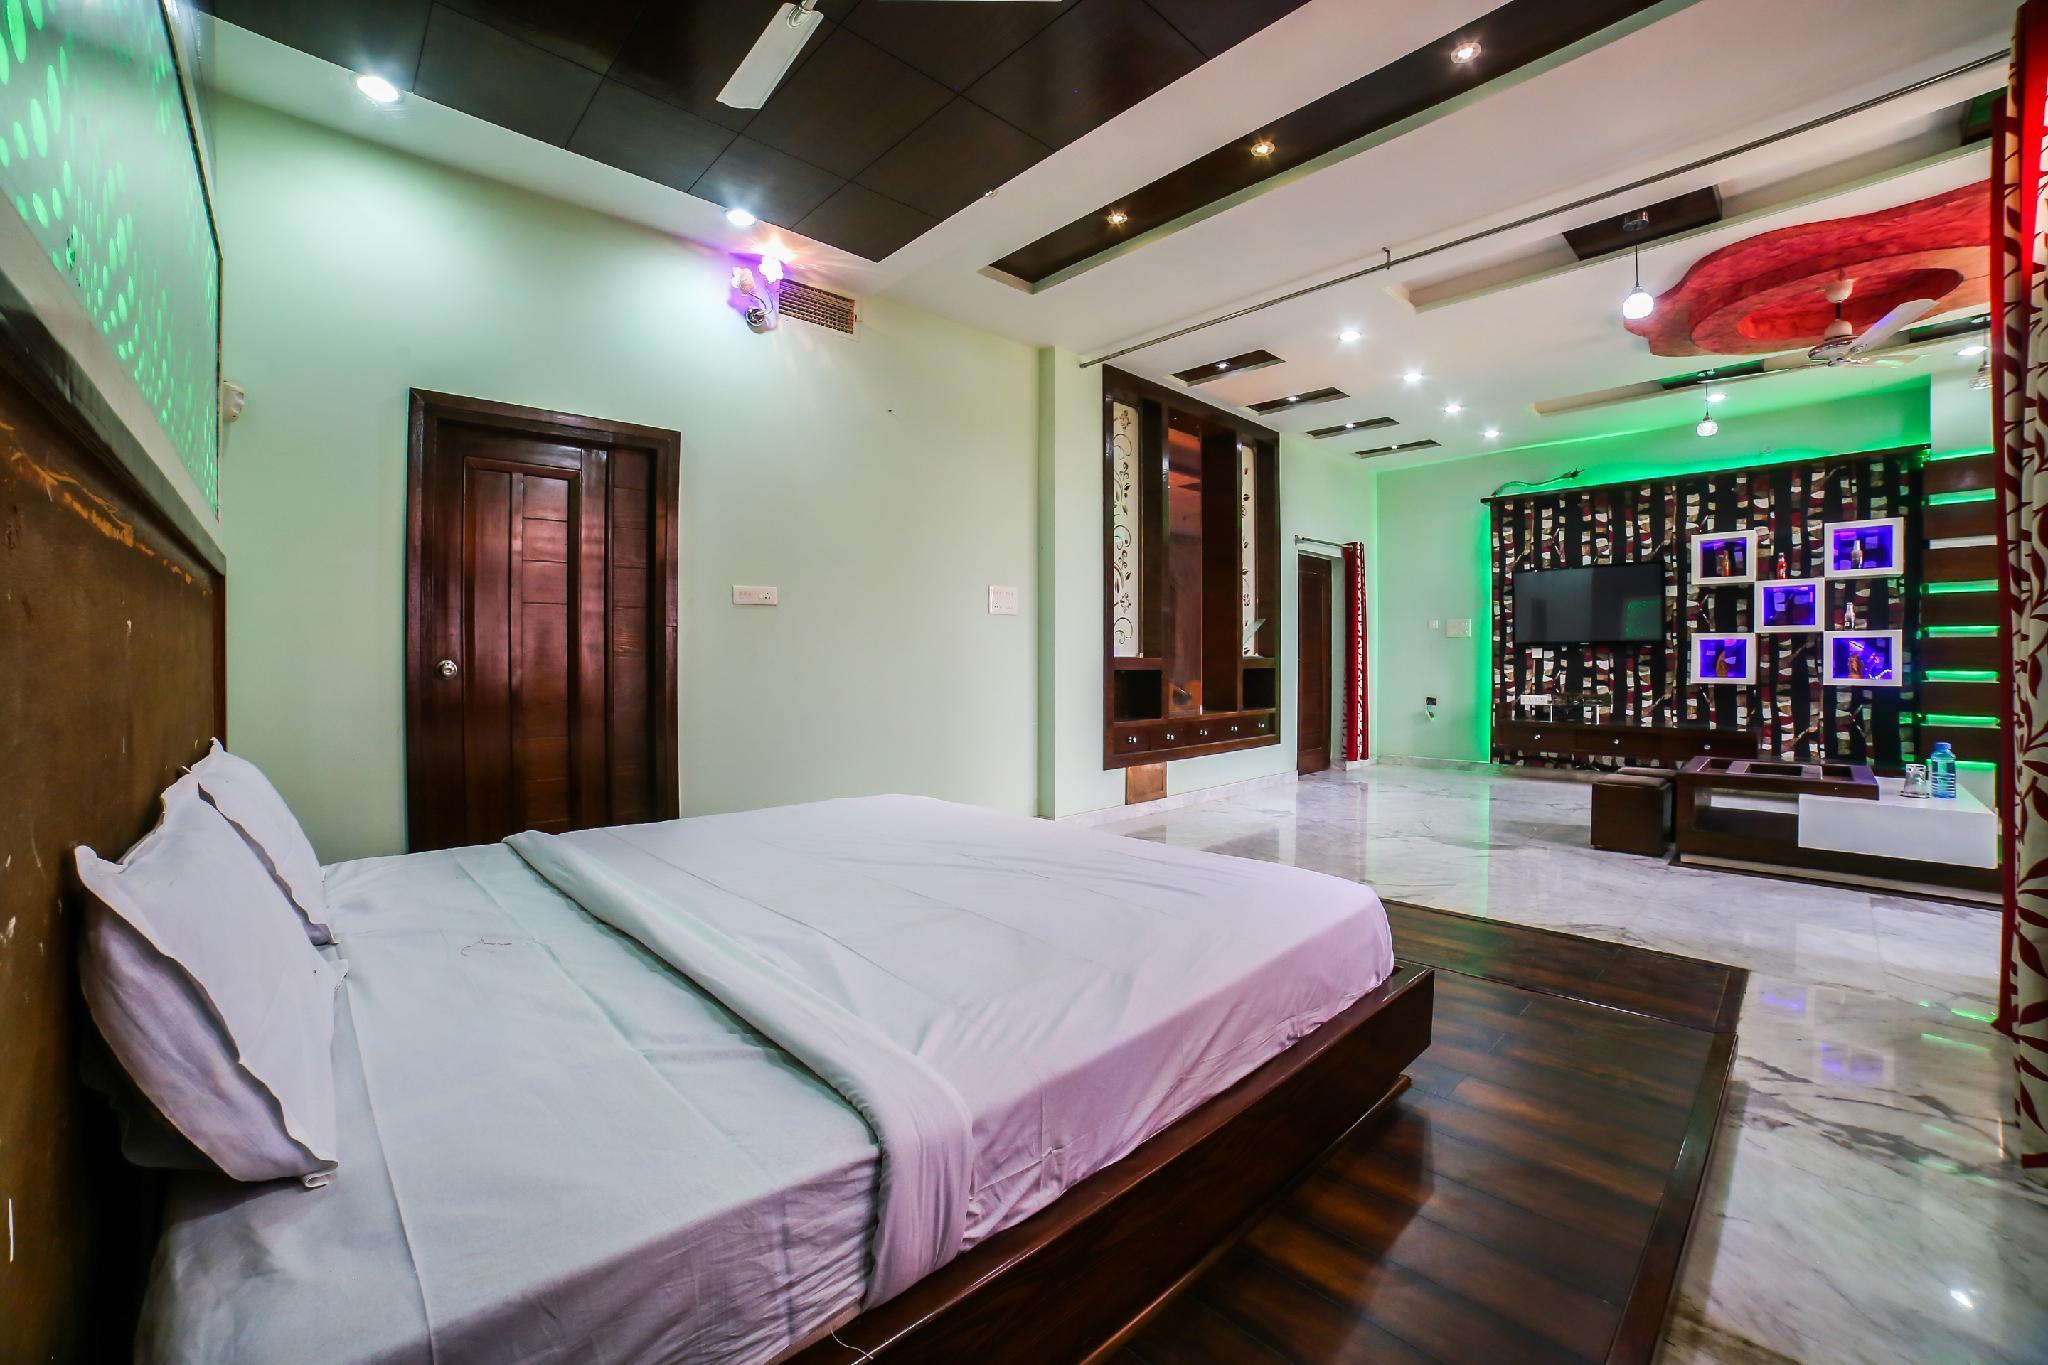 SPOT ON 40217 Aryawat Guest House